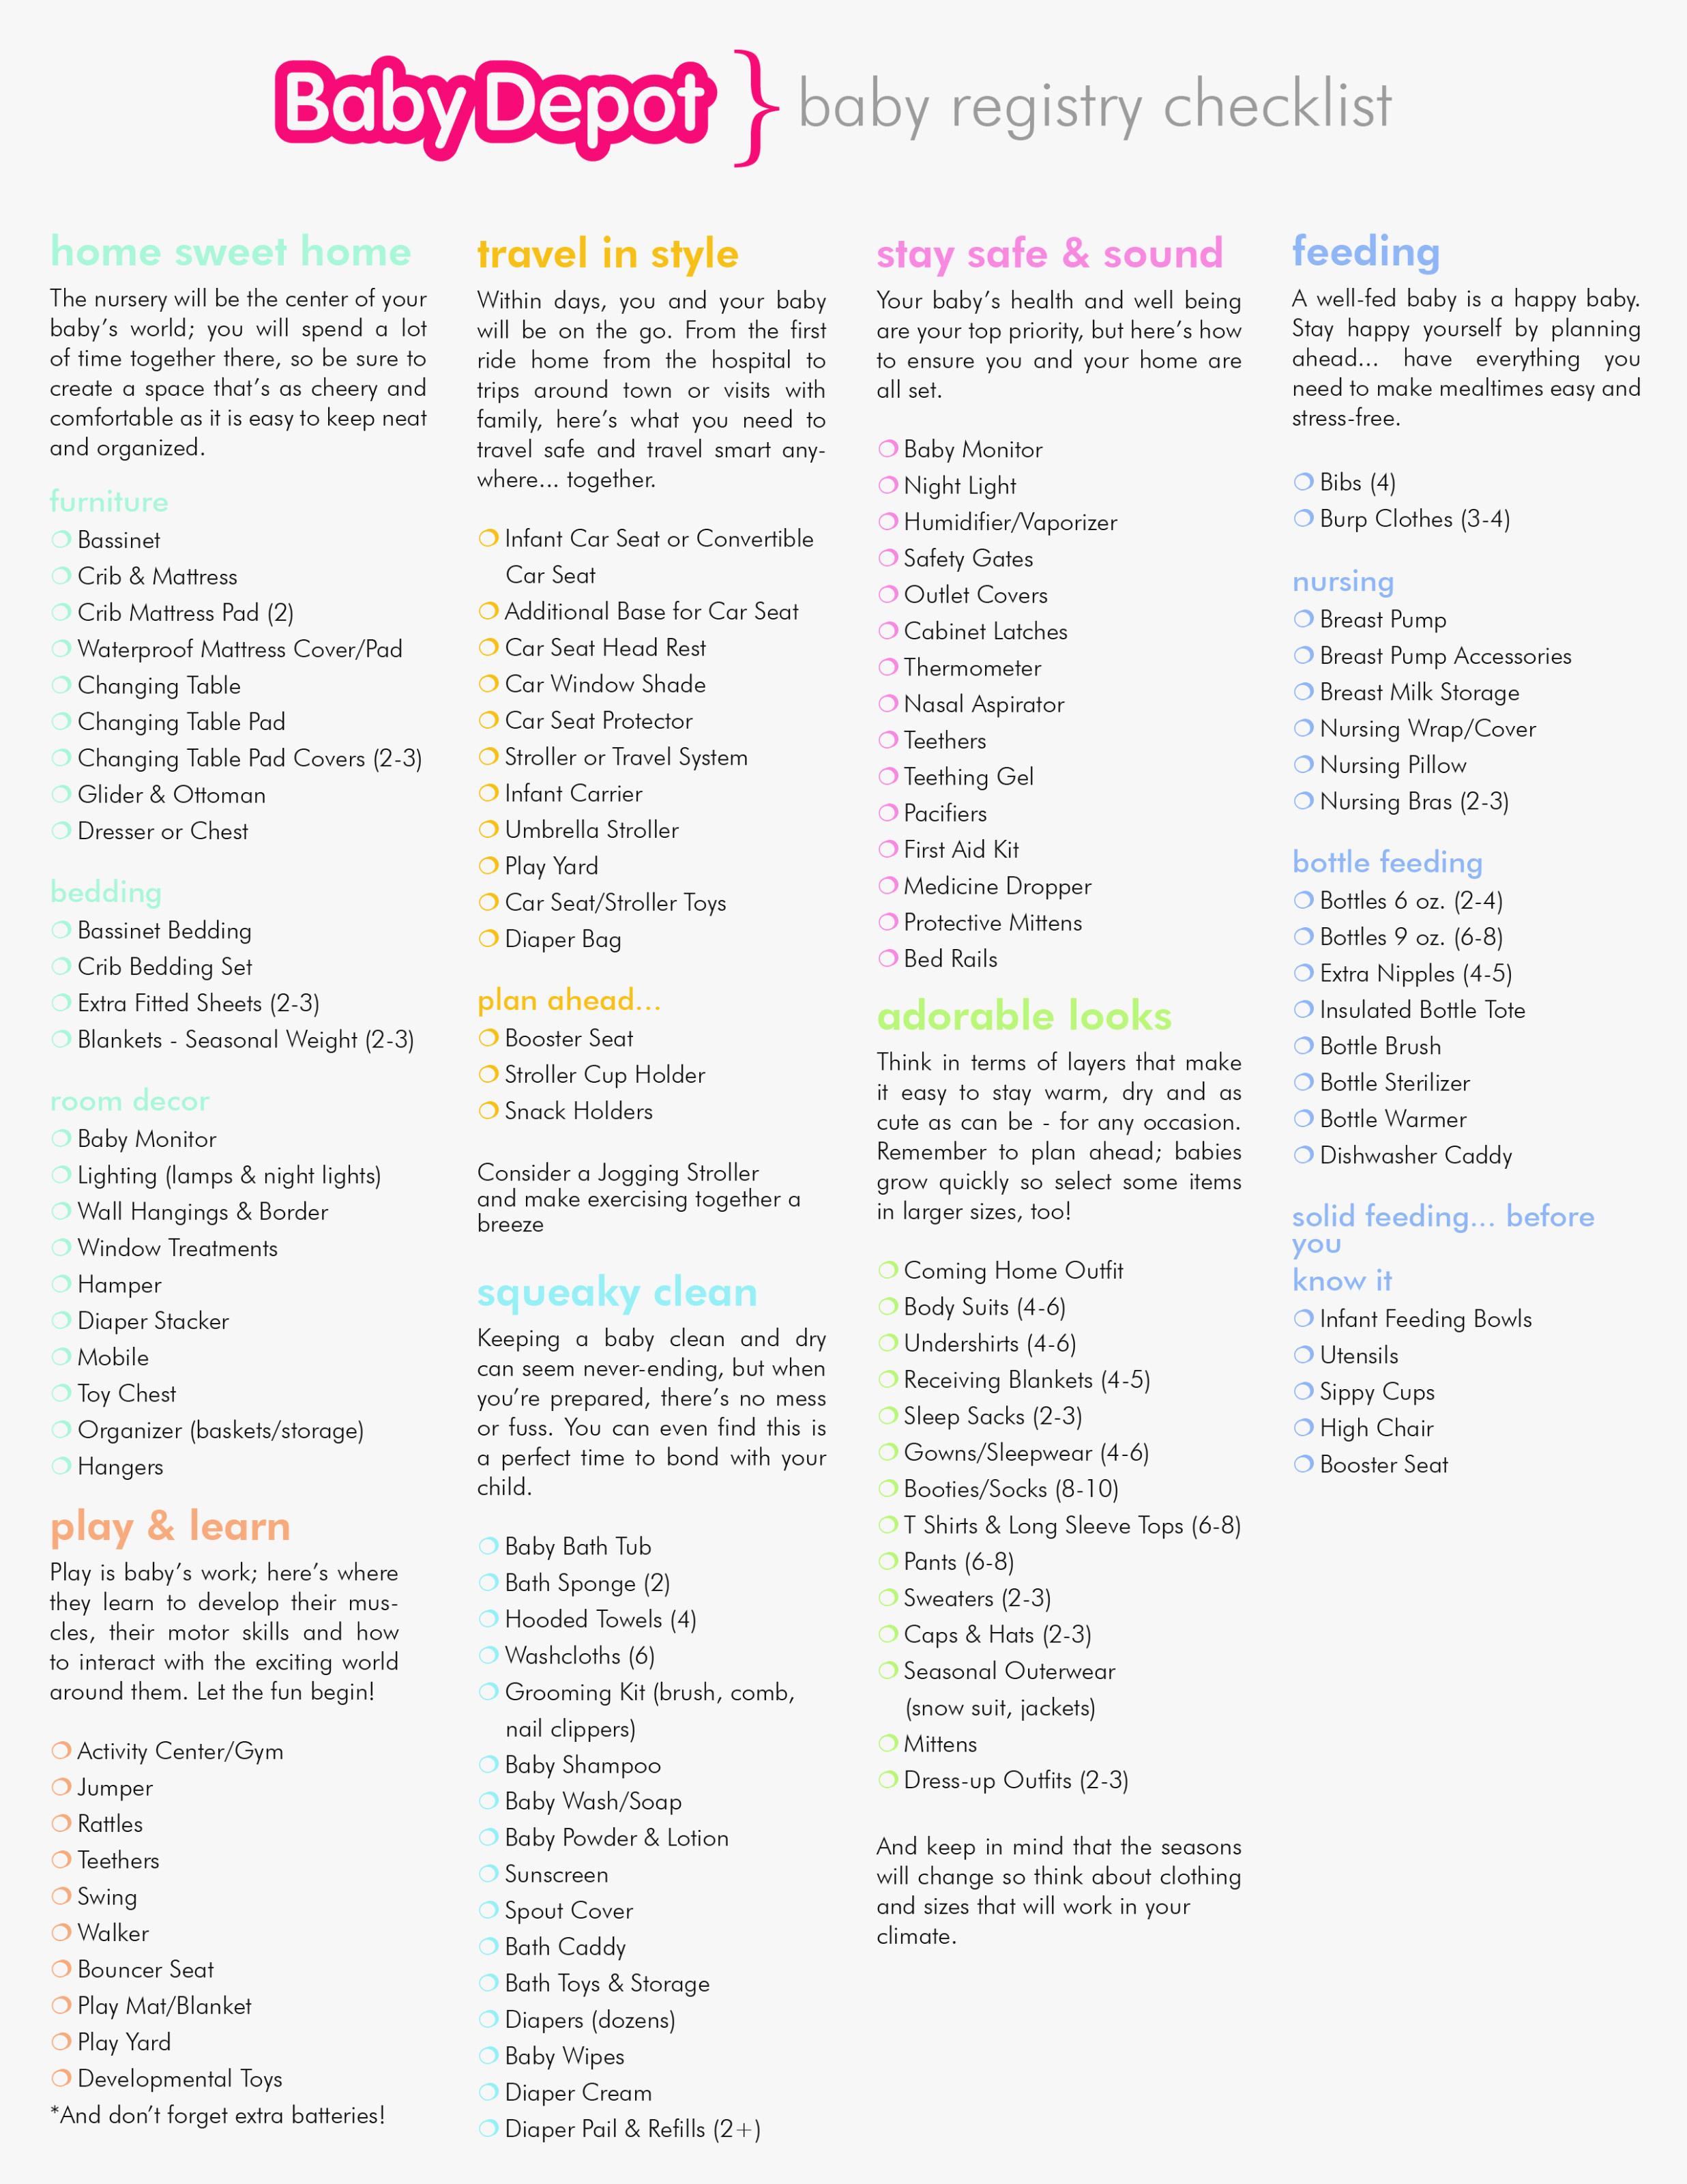 Wedding Registry Spreadsheet Pertaining To Registry List Wedding Checklist Fresh Wedding Home Depot Wedding